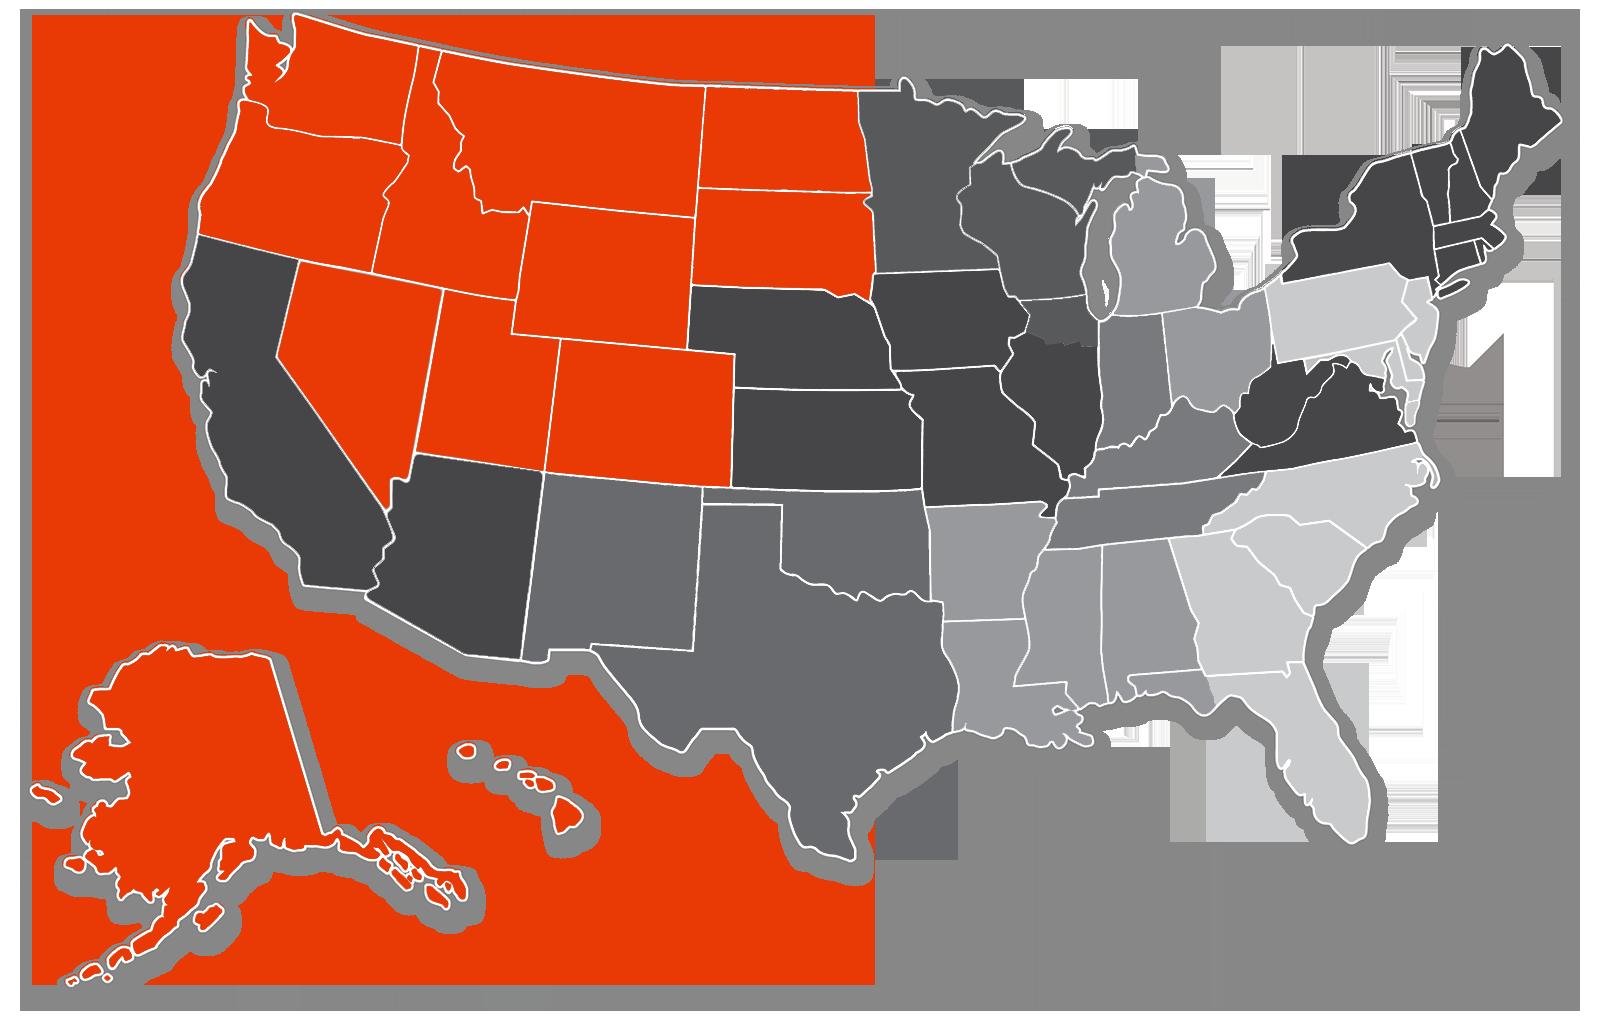 T2 - Northwest/Mountain States Territory